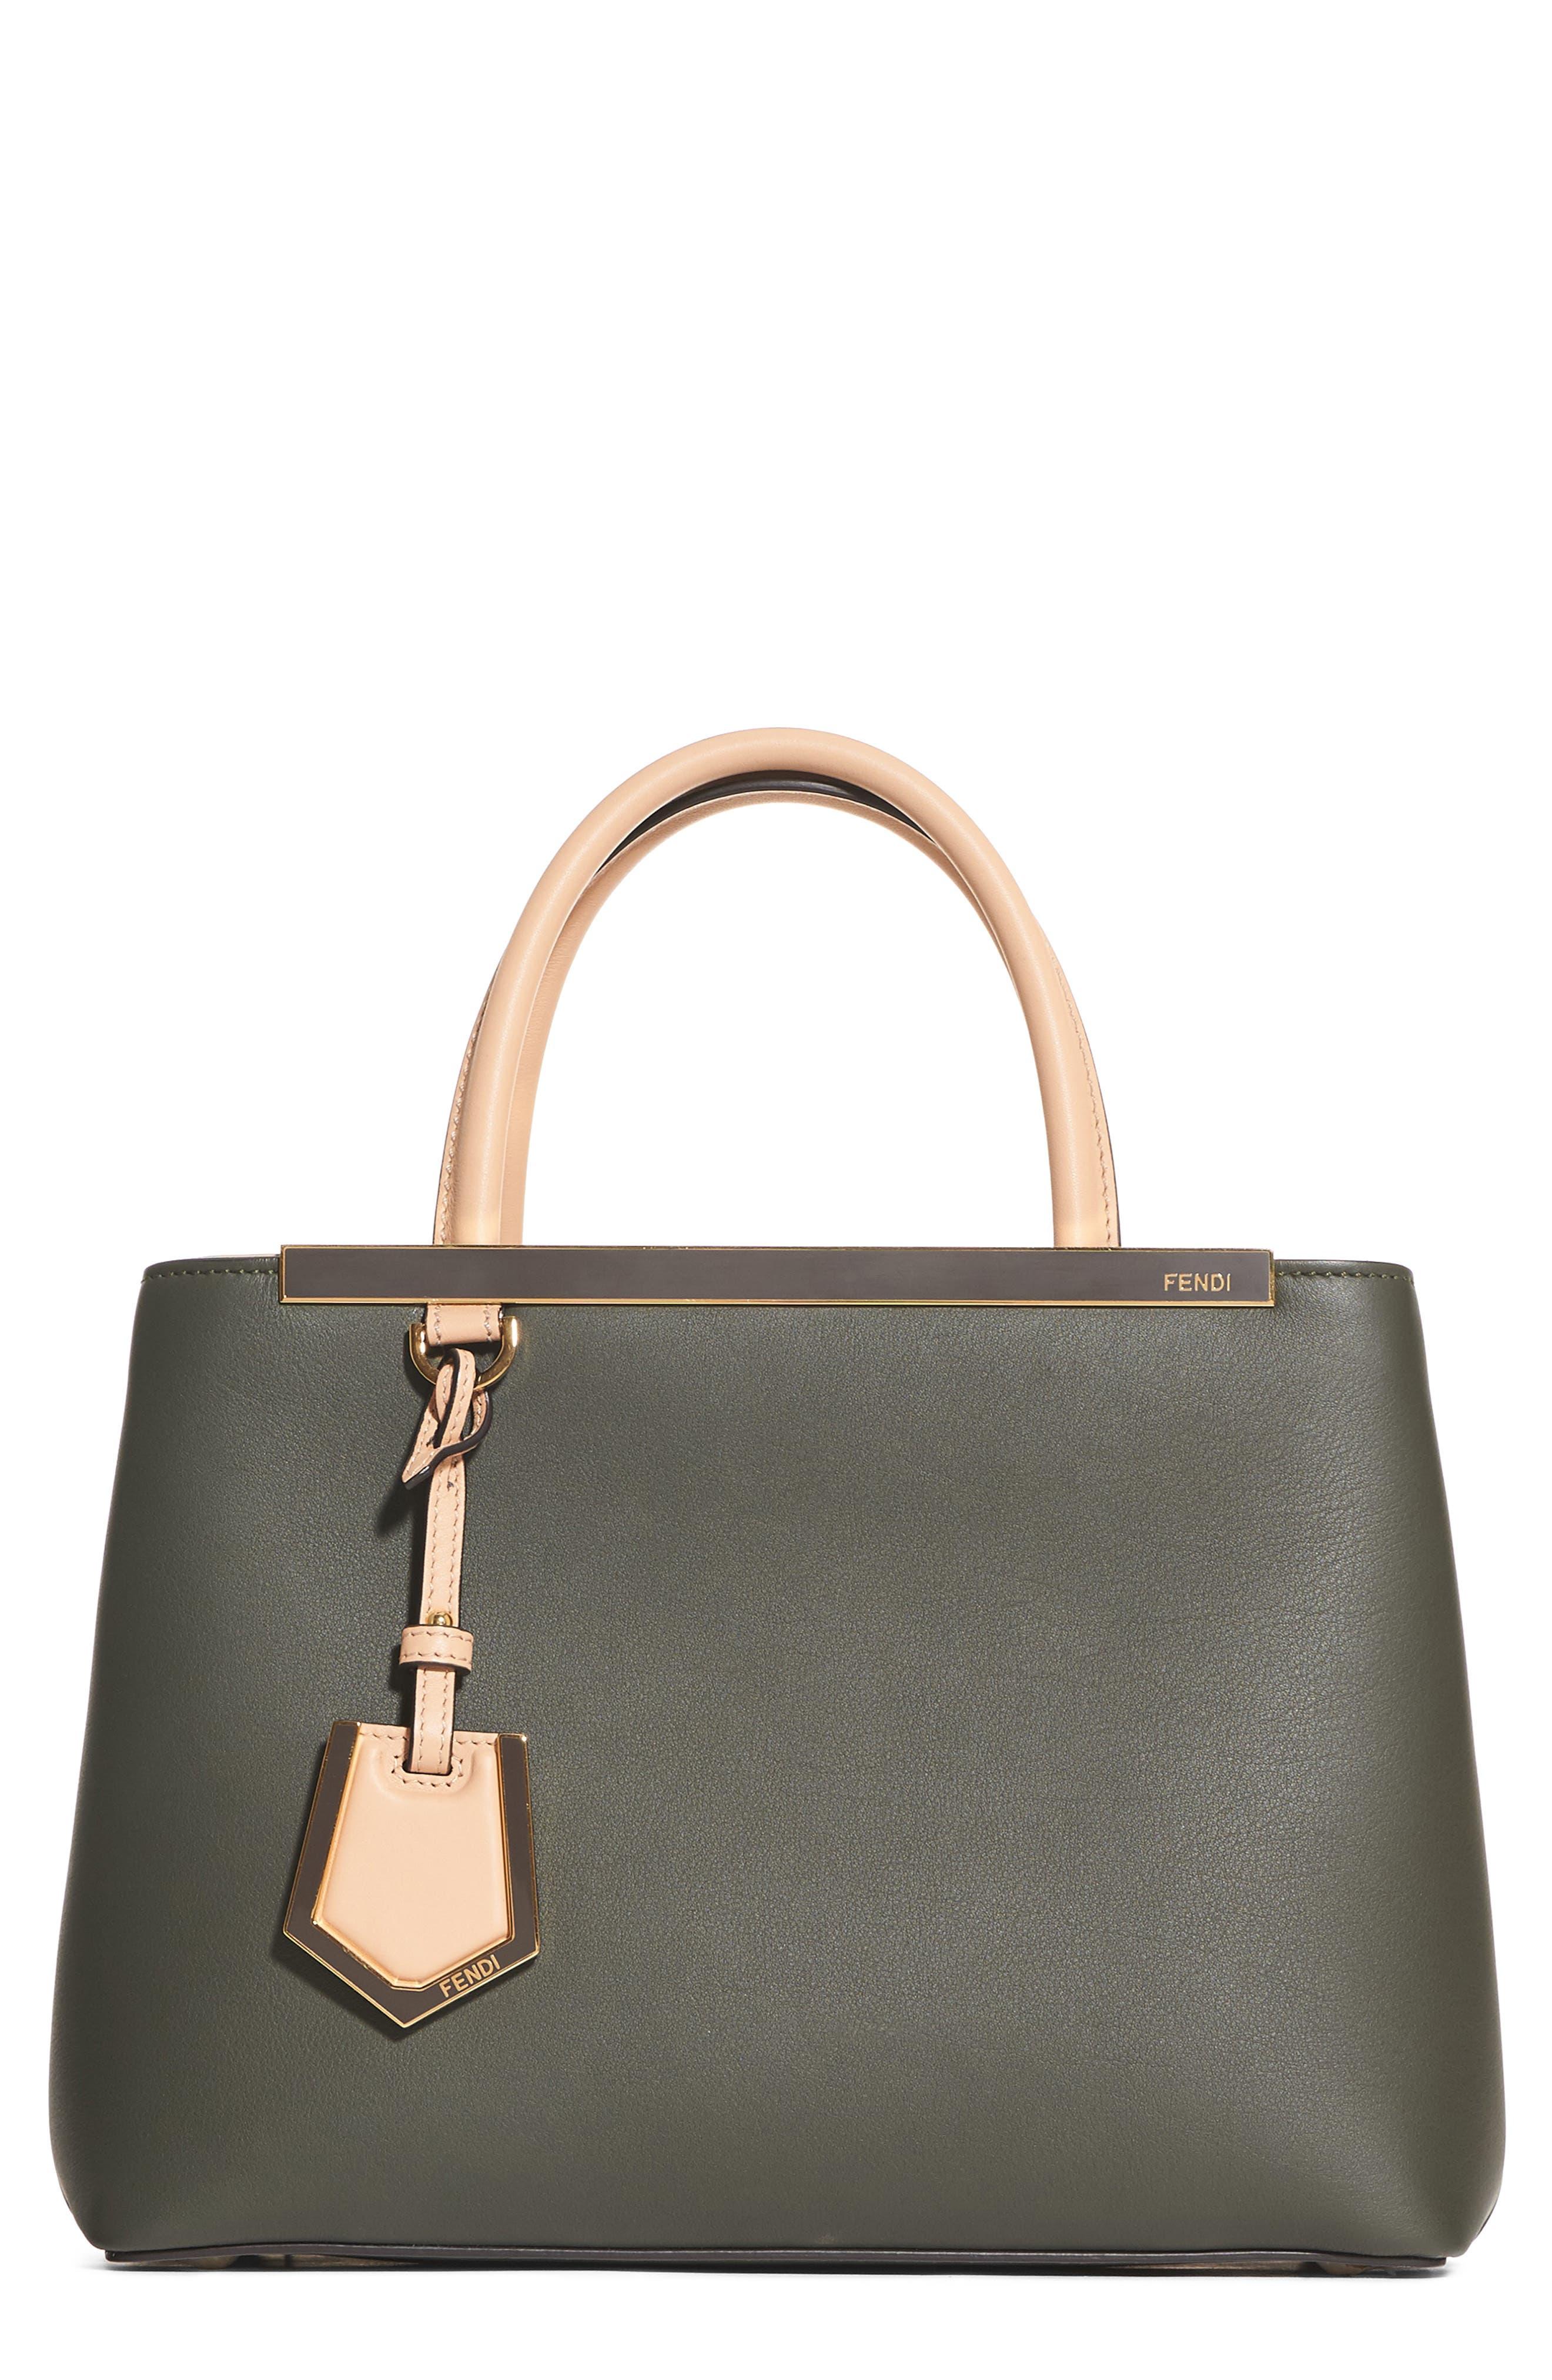 Fendi Petite 2Jours Leather Shopper